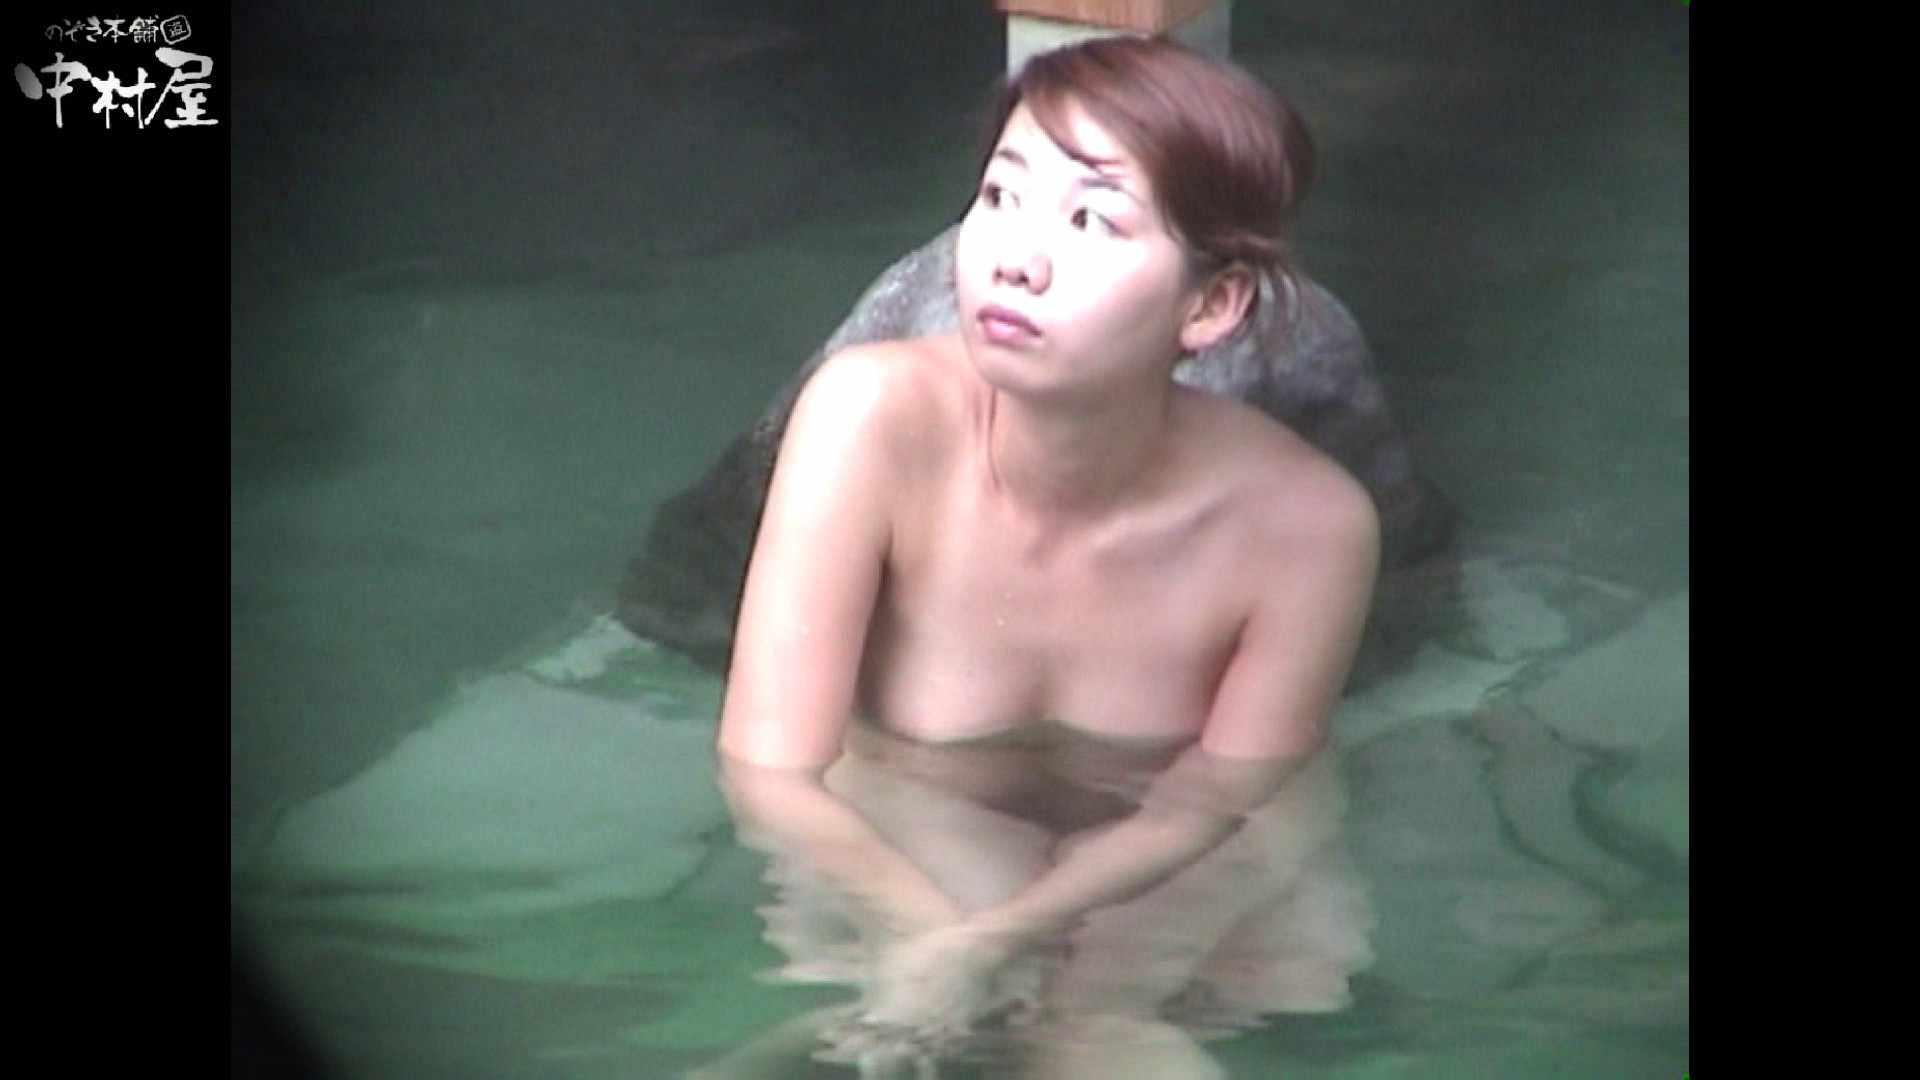 Aquaな露天風呂Vol.951 盗撮  80連発 75